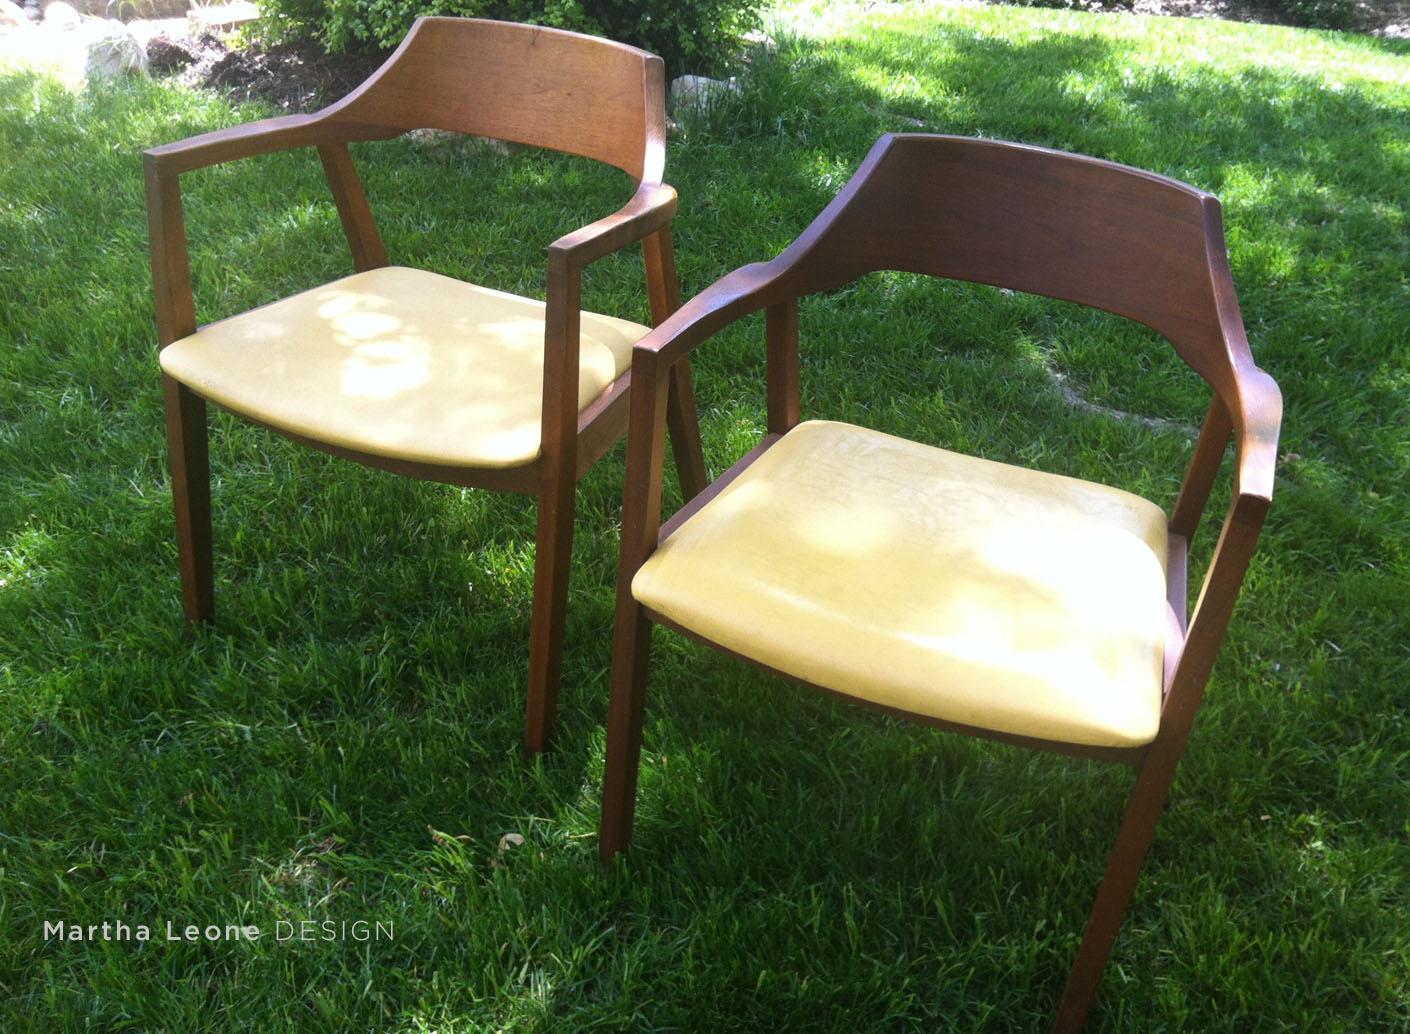 jasper chair company hanging zippay buy old  martha leone design